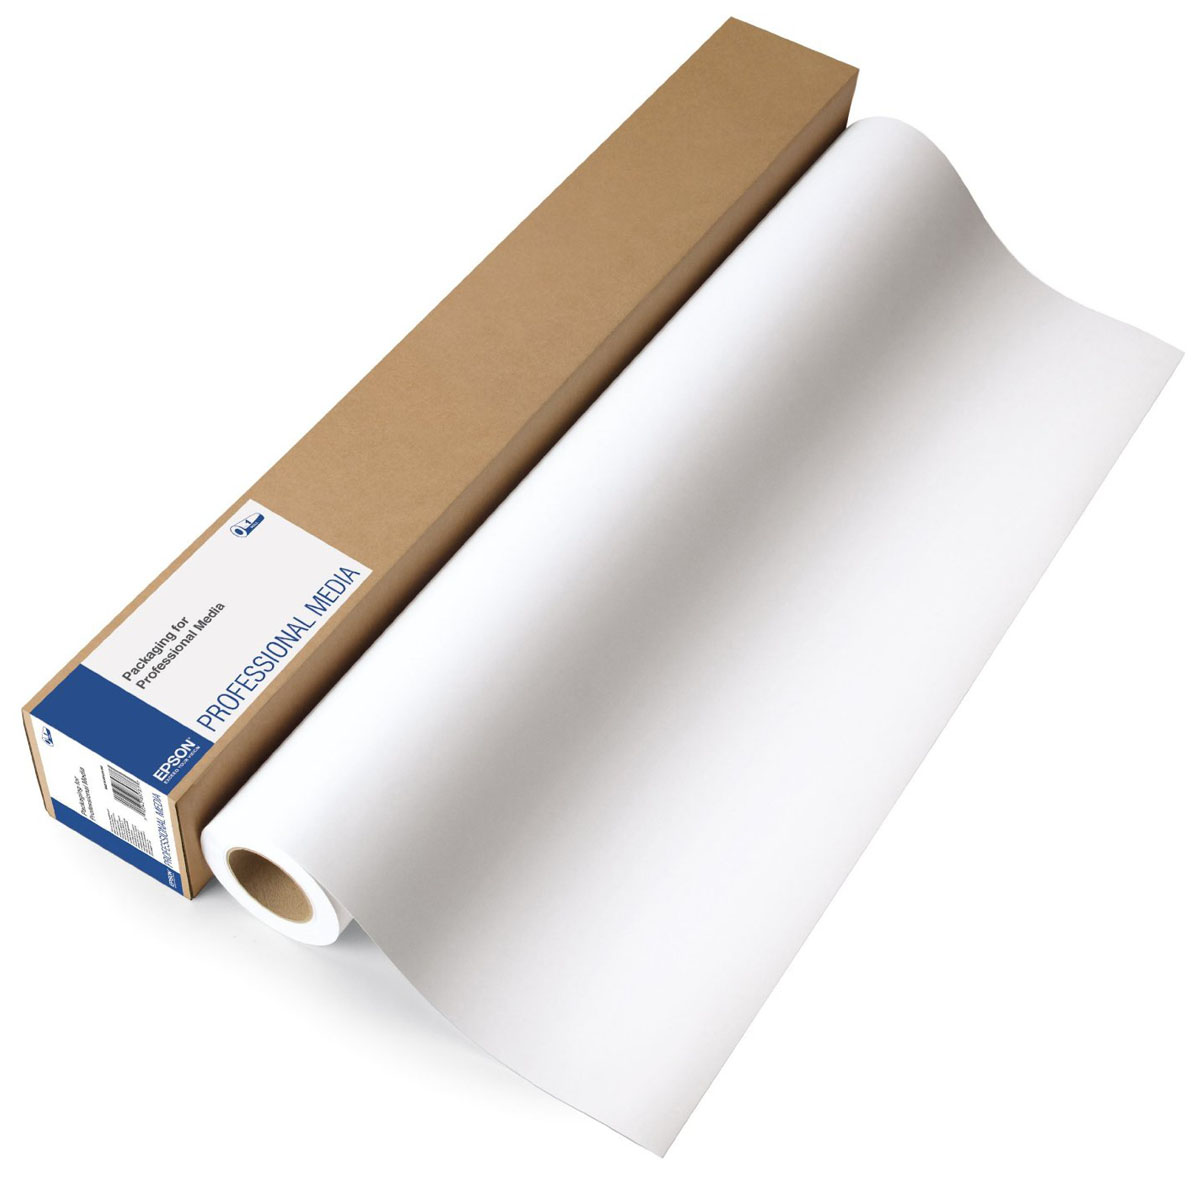 Semigloss Inkjet Heavy Weight Paper 44in. x 82ft Roll